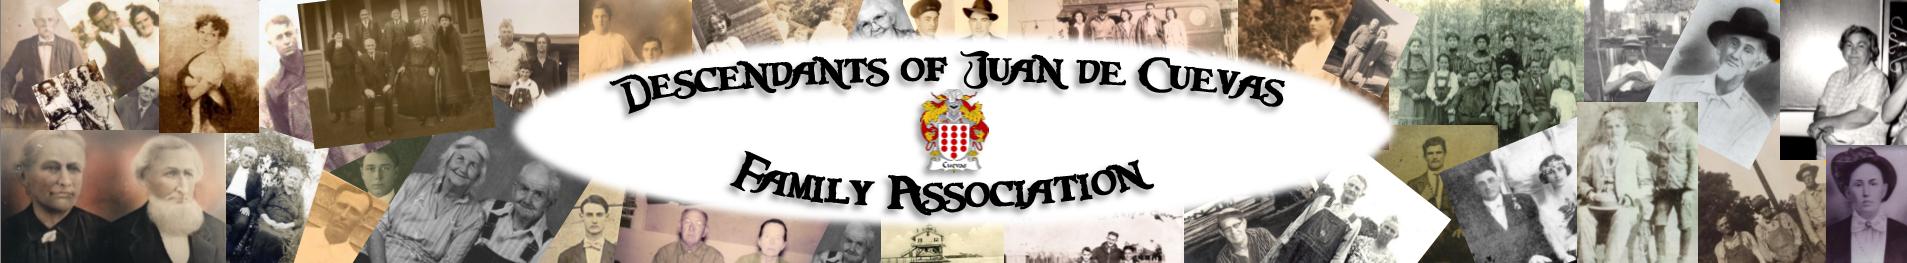 Descendants of Juan de Cuevas Family Association